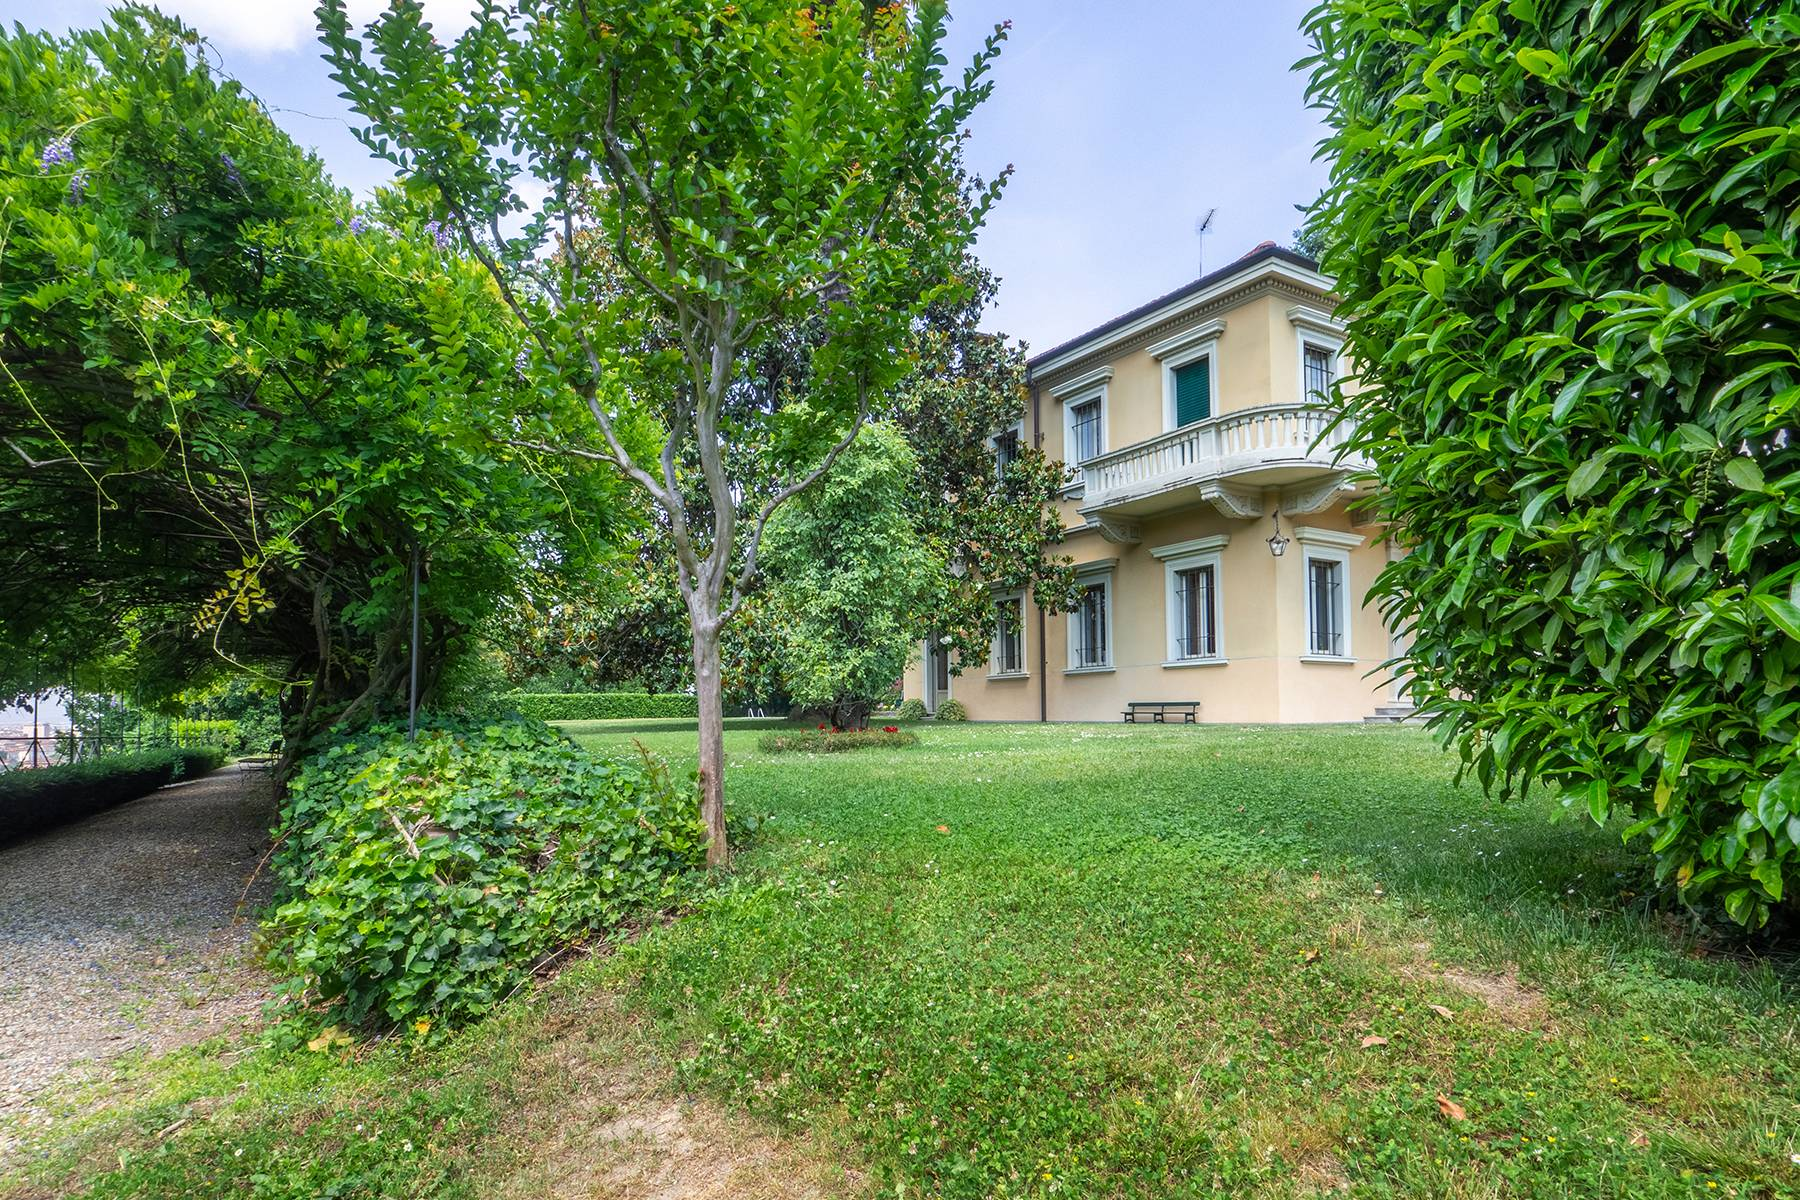 Casa indipendente in Vendita a Torino: 5 locali, 657 mq - Foto 22